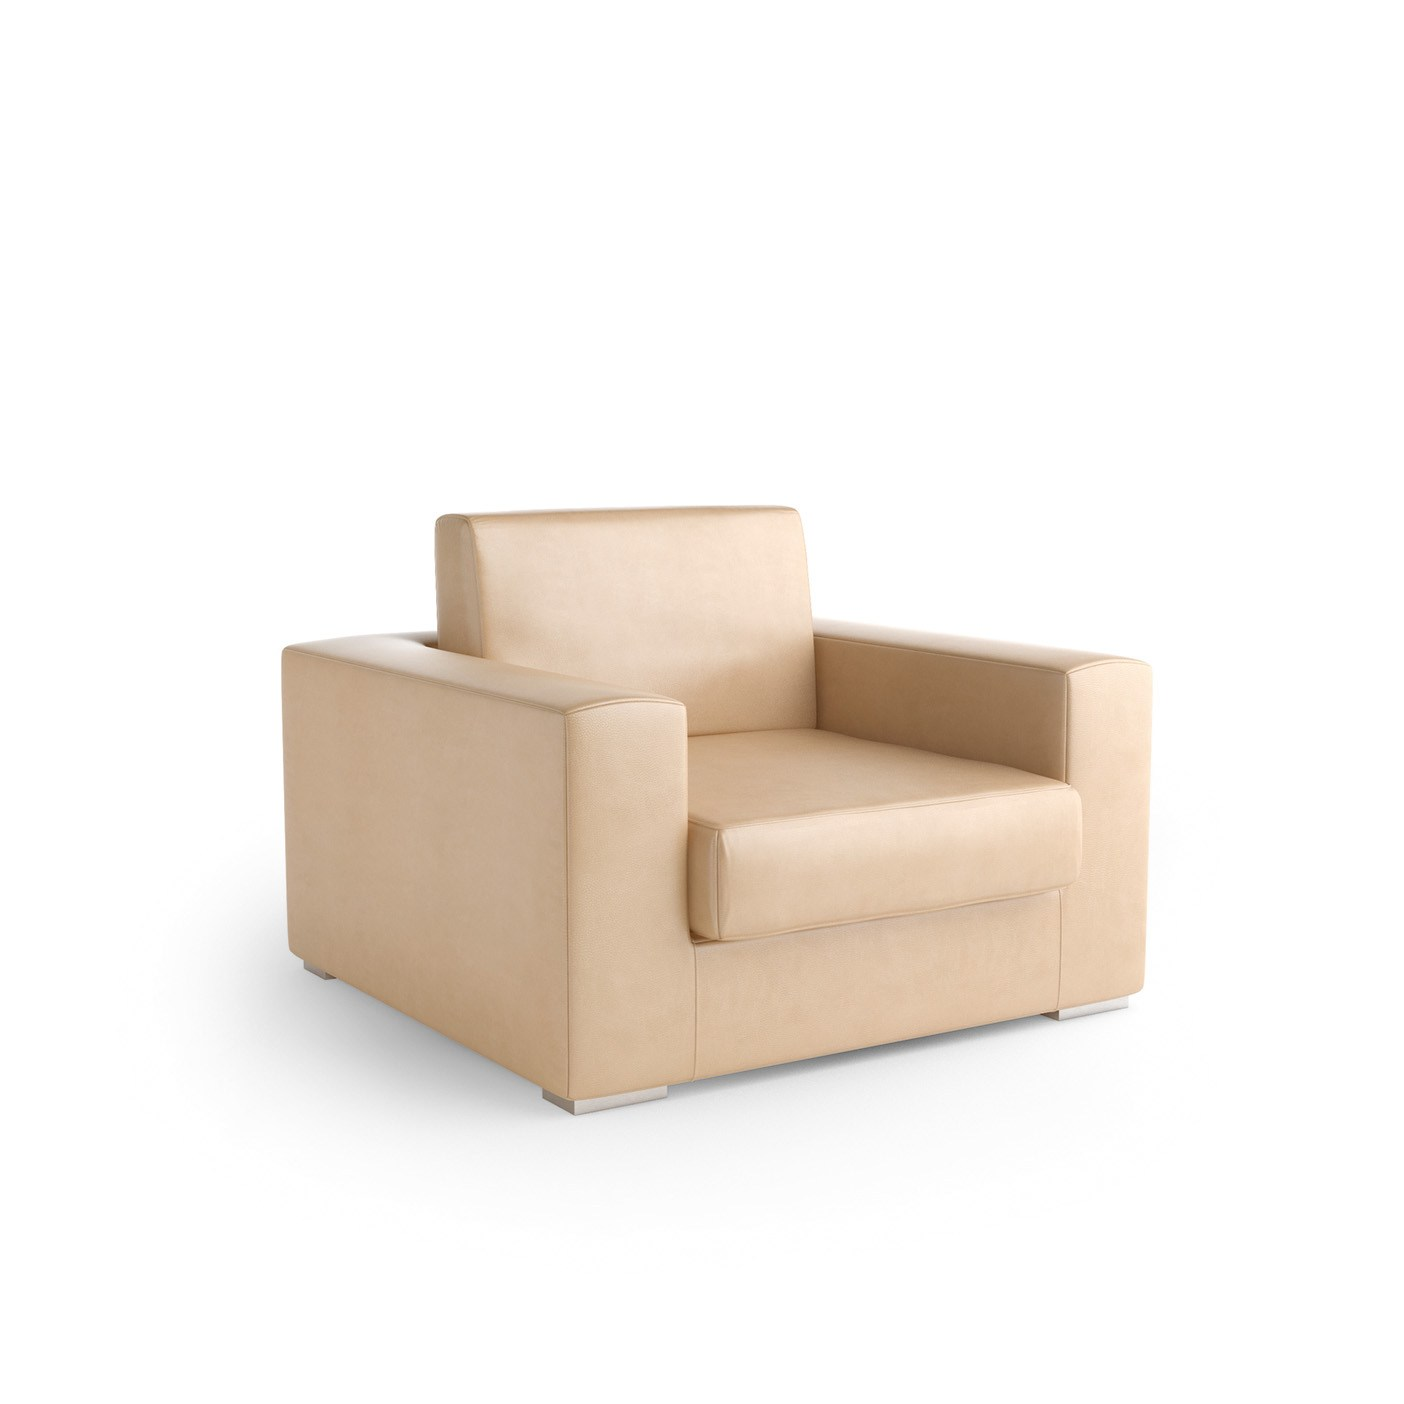 theca fauteuil avec porte revues int 233 gr 233 collection concept by caroti